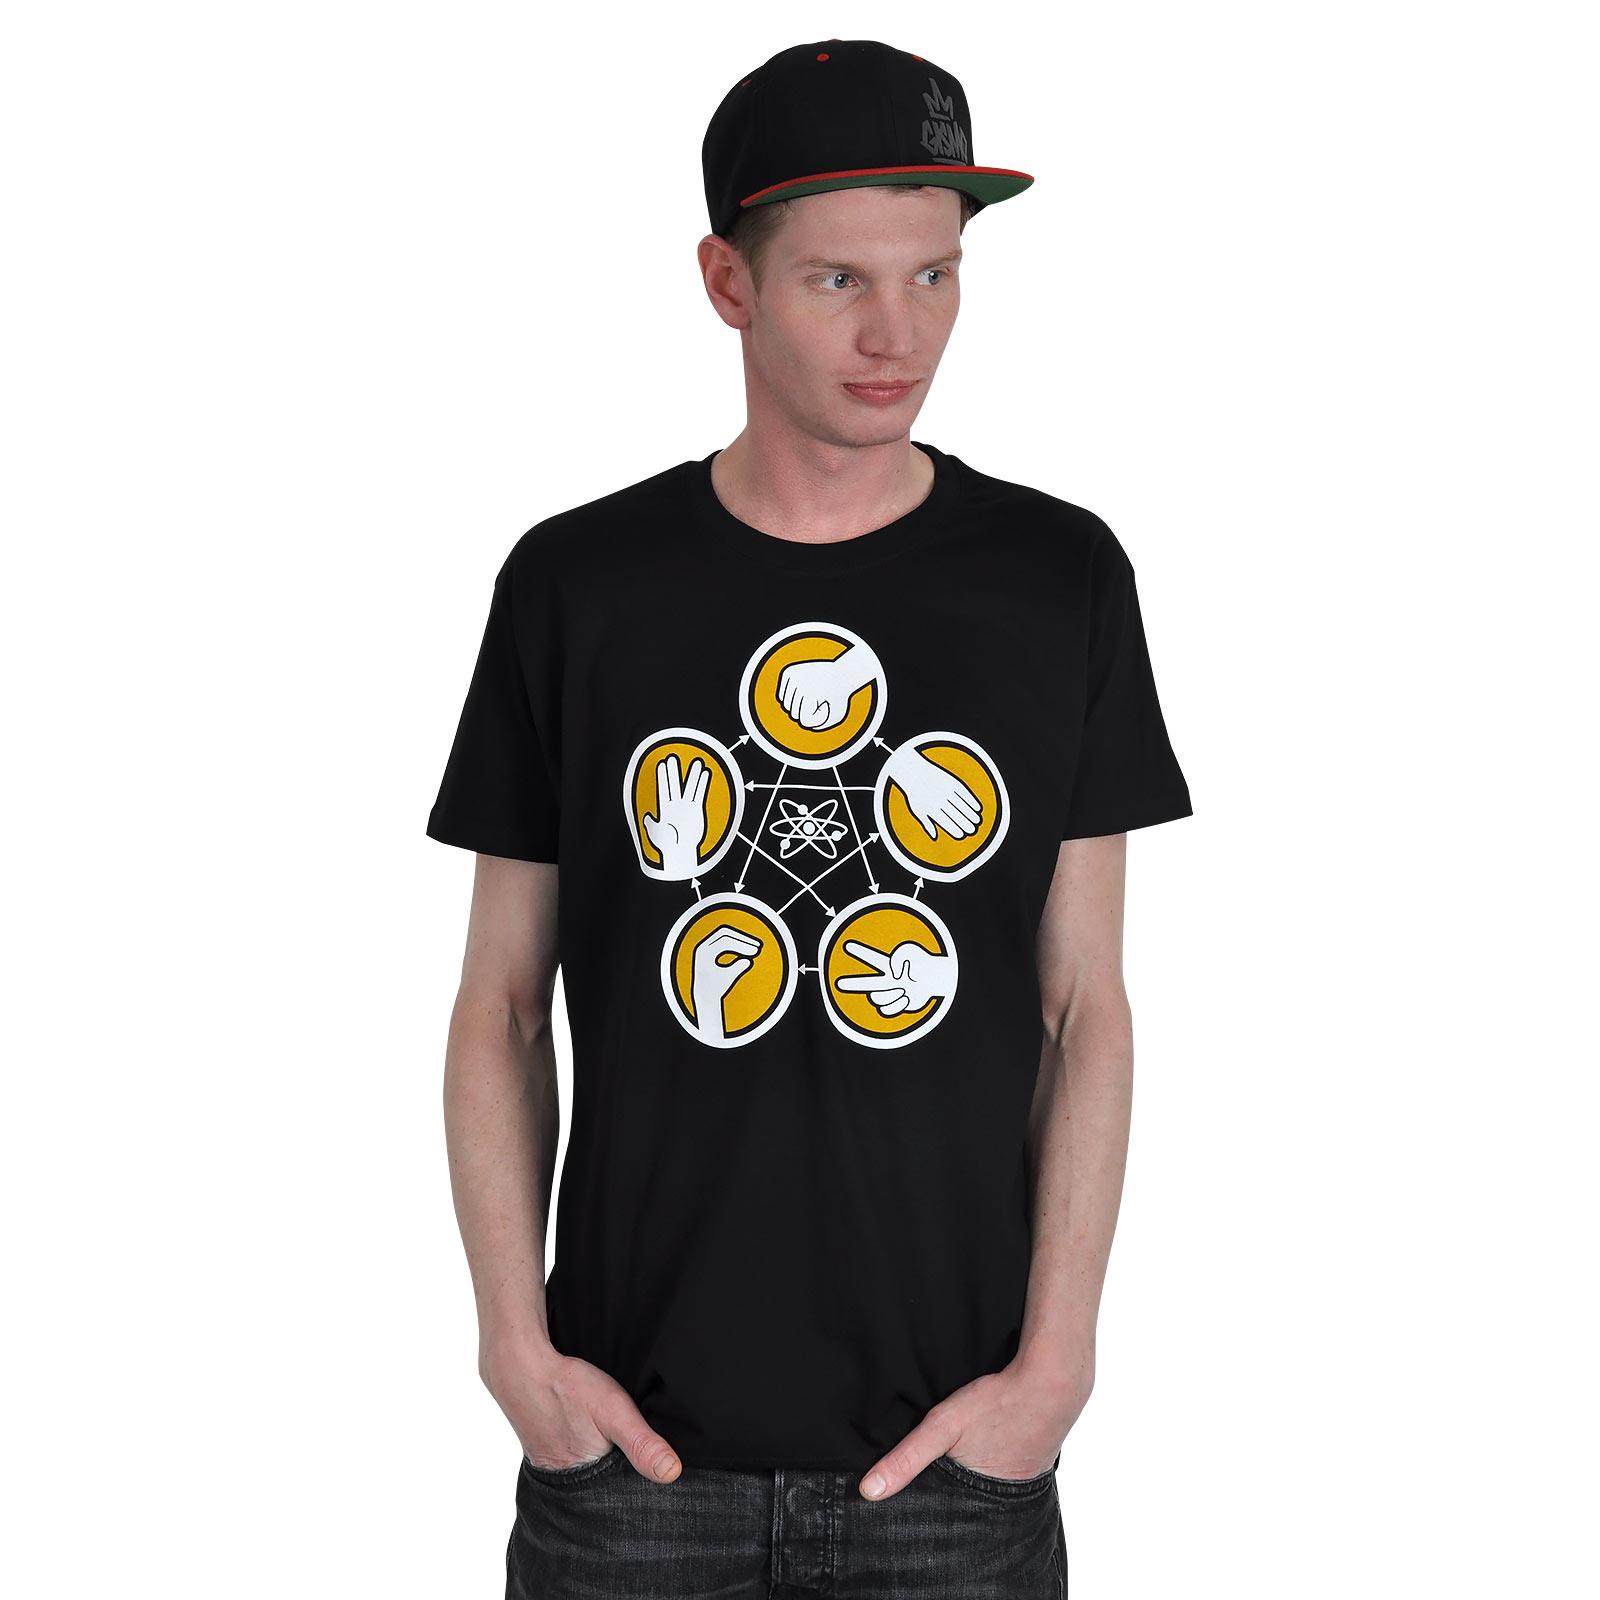 Game T-Shirt für The Big Bang Theory Fans